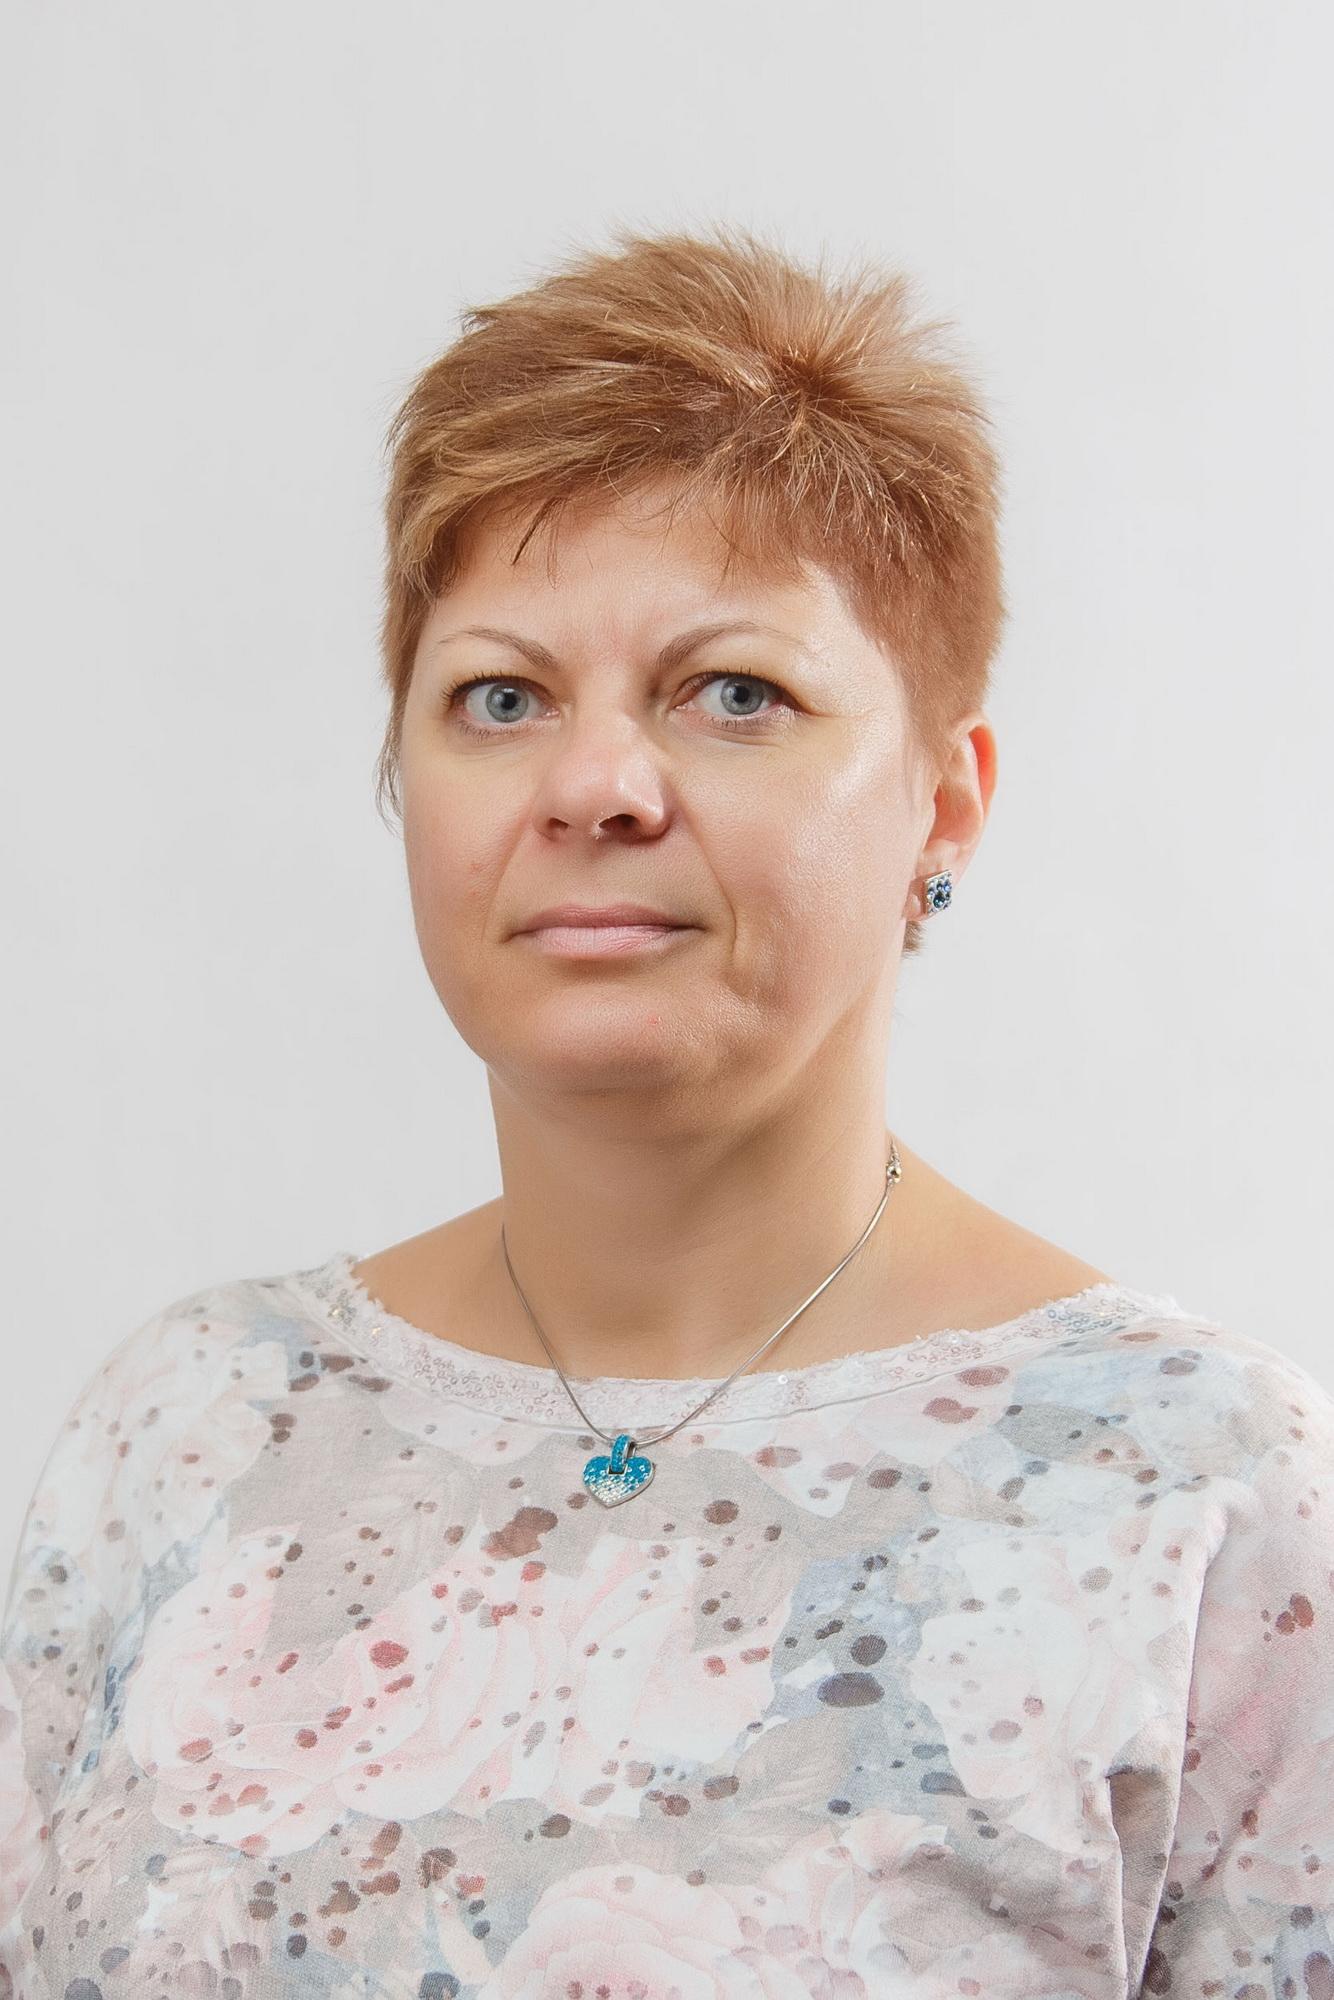 Mgr. Miroslav Kaltenbruner